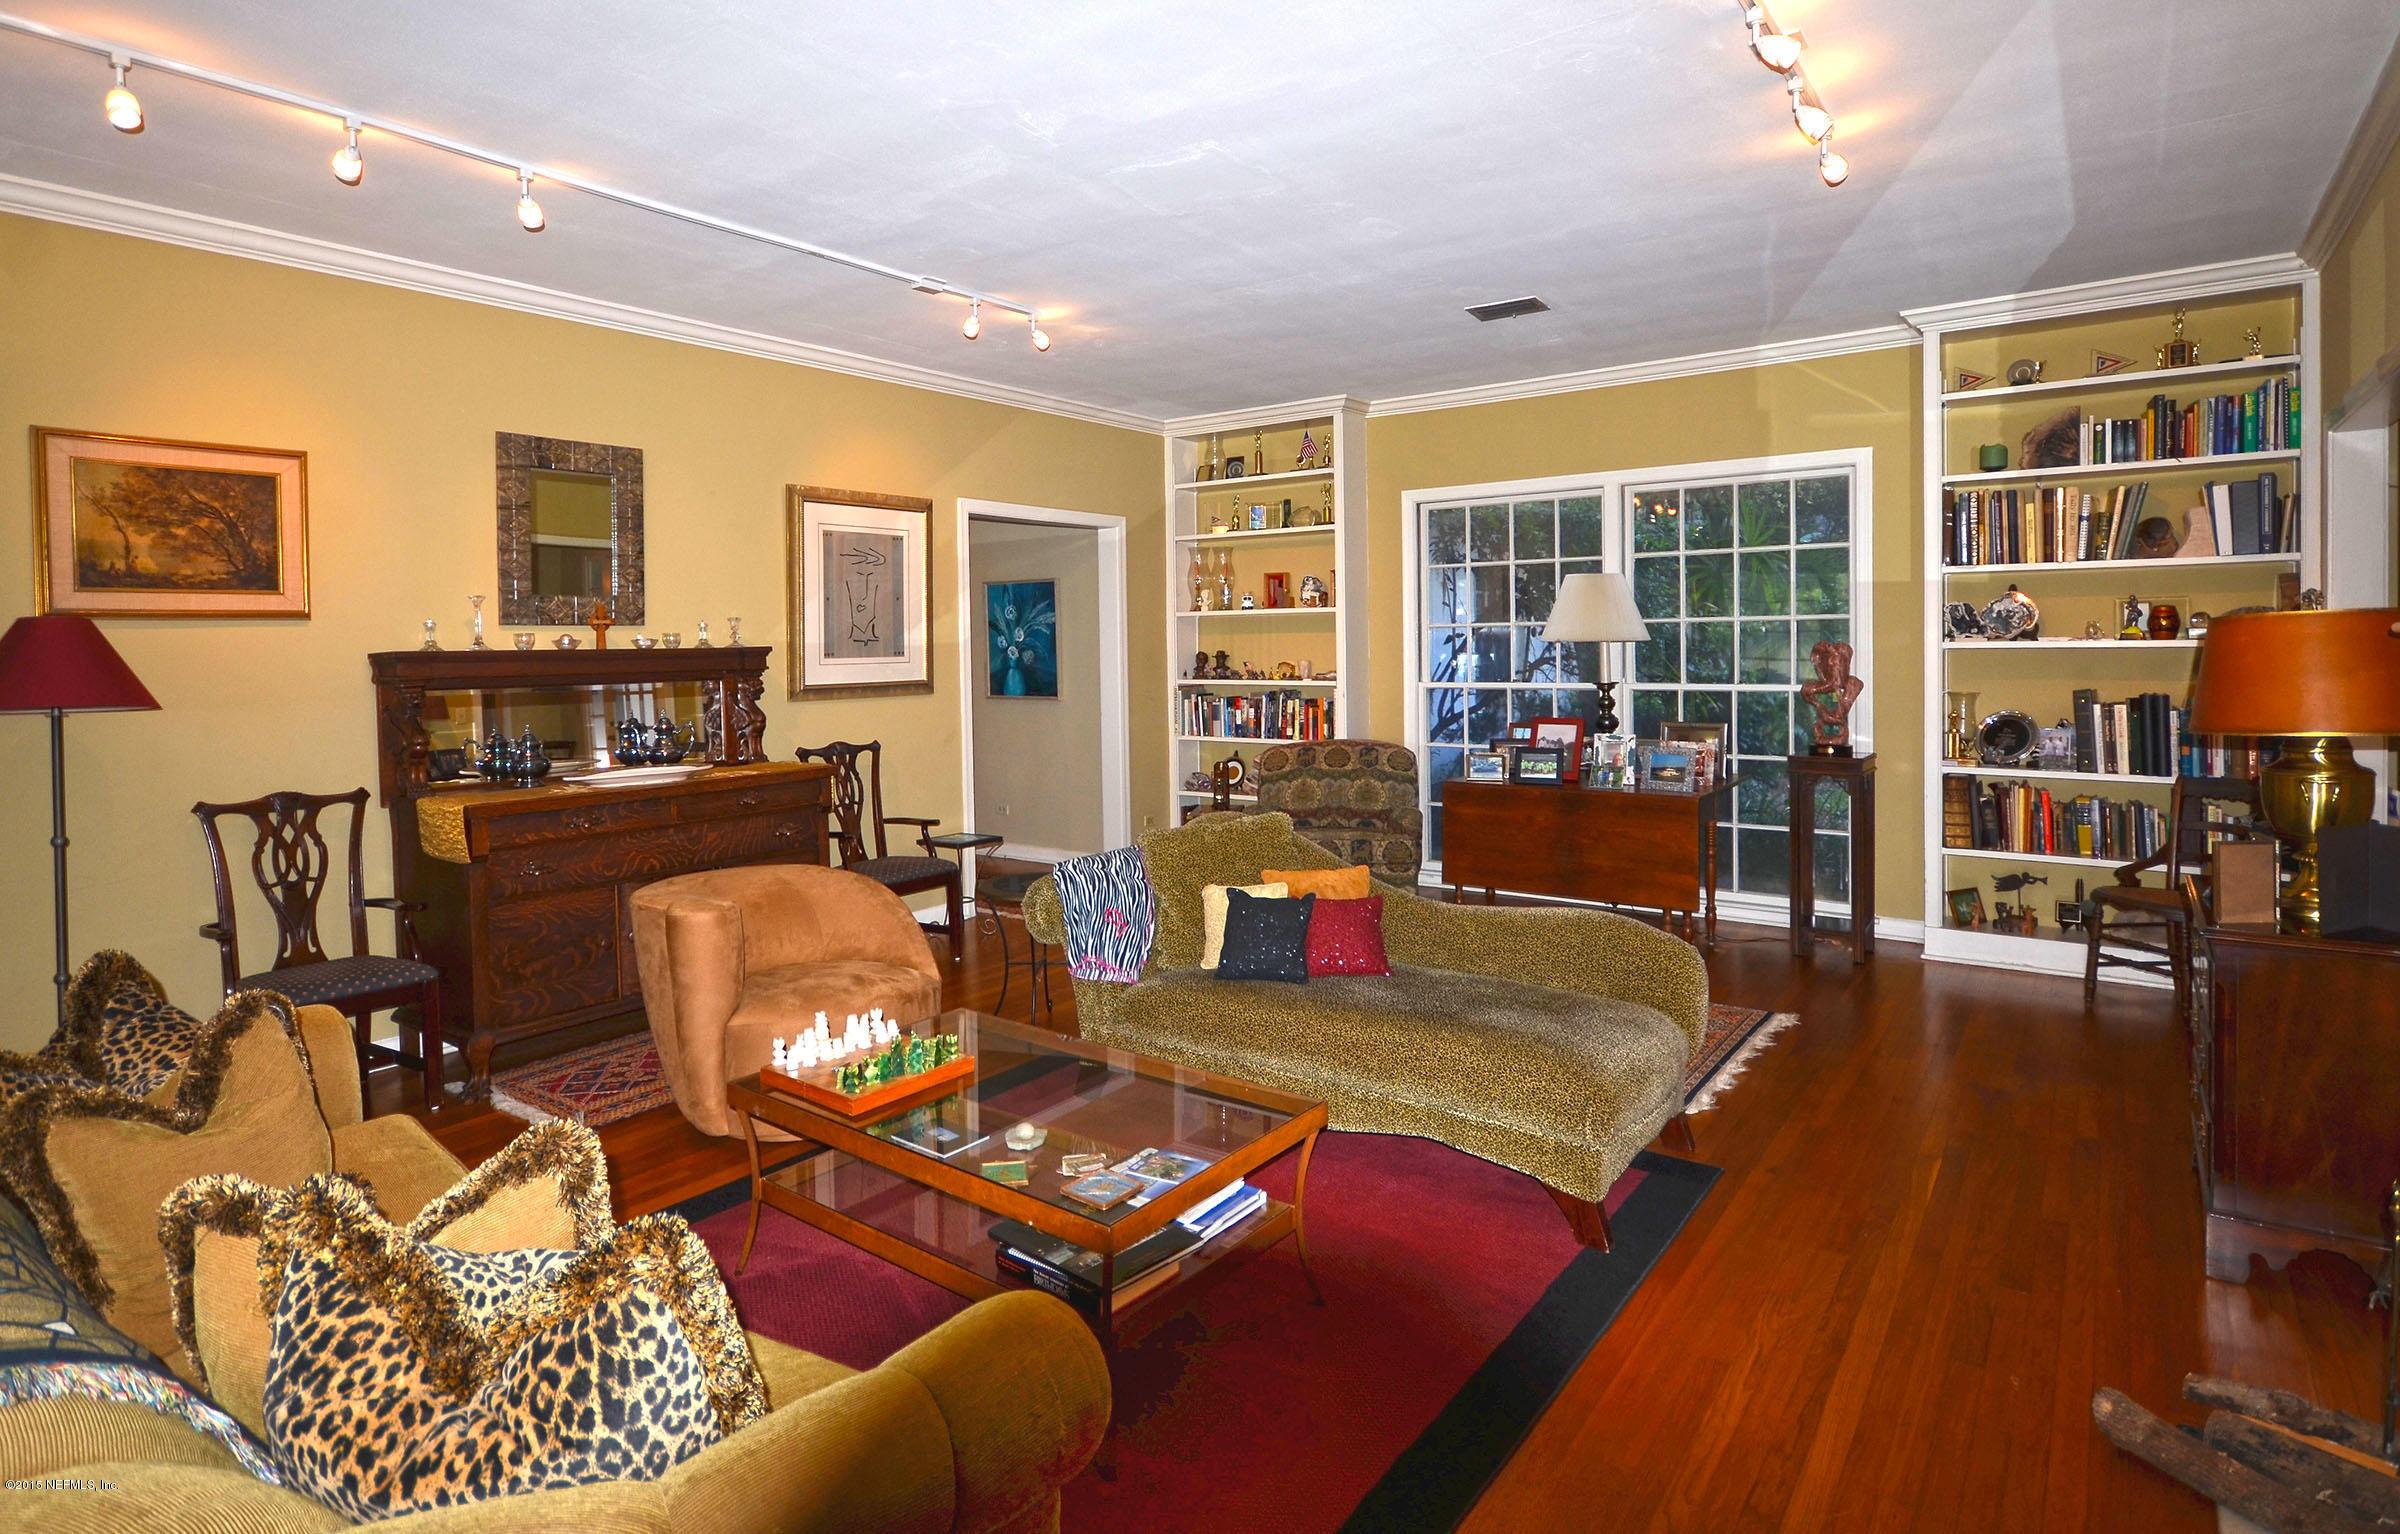 4939 Morven, JACKSONVILLE, FLORIDA 32210, 5 Bedrooms Bedrooms, ,4 BathroomsBathrooms,Residential - single family,For sale,Morven,766541